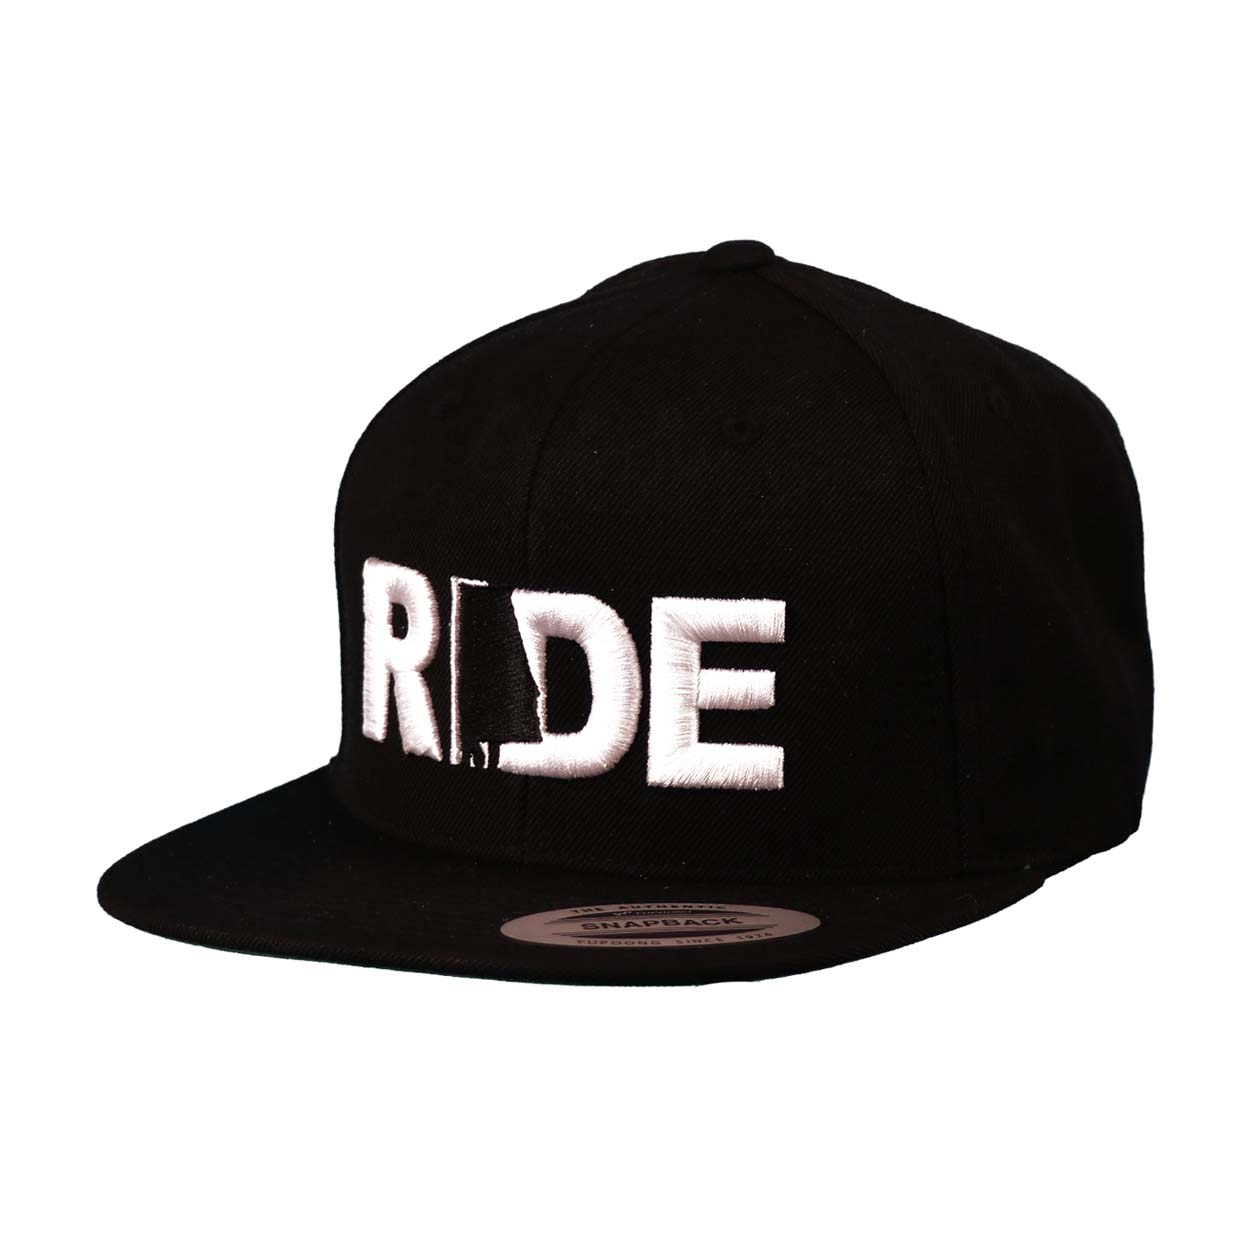 Ride Alabama Classic Embroidered  Snapback Flat Brim Hat Black/White